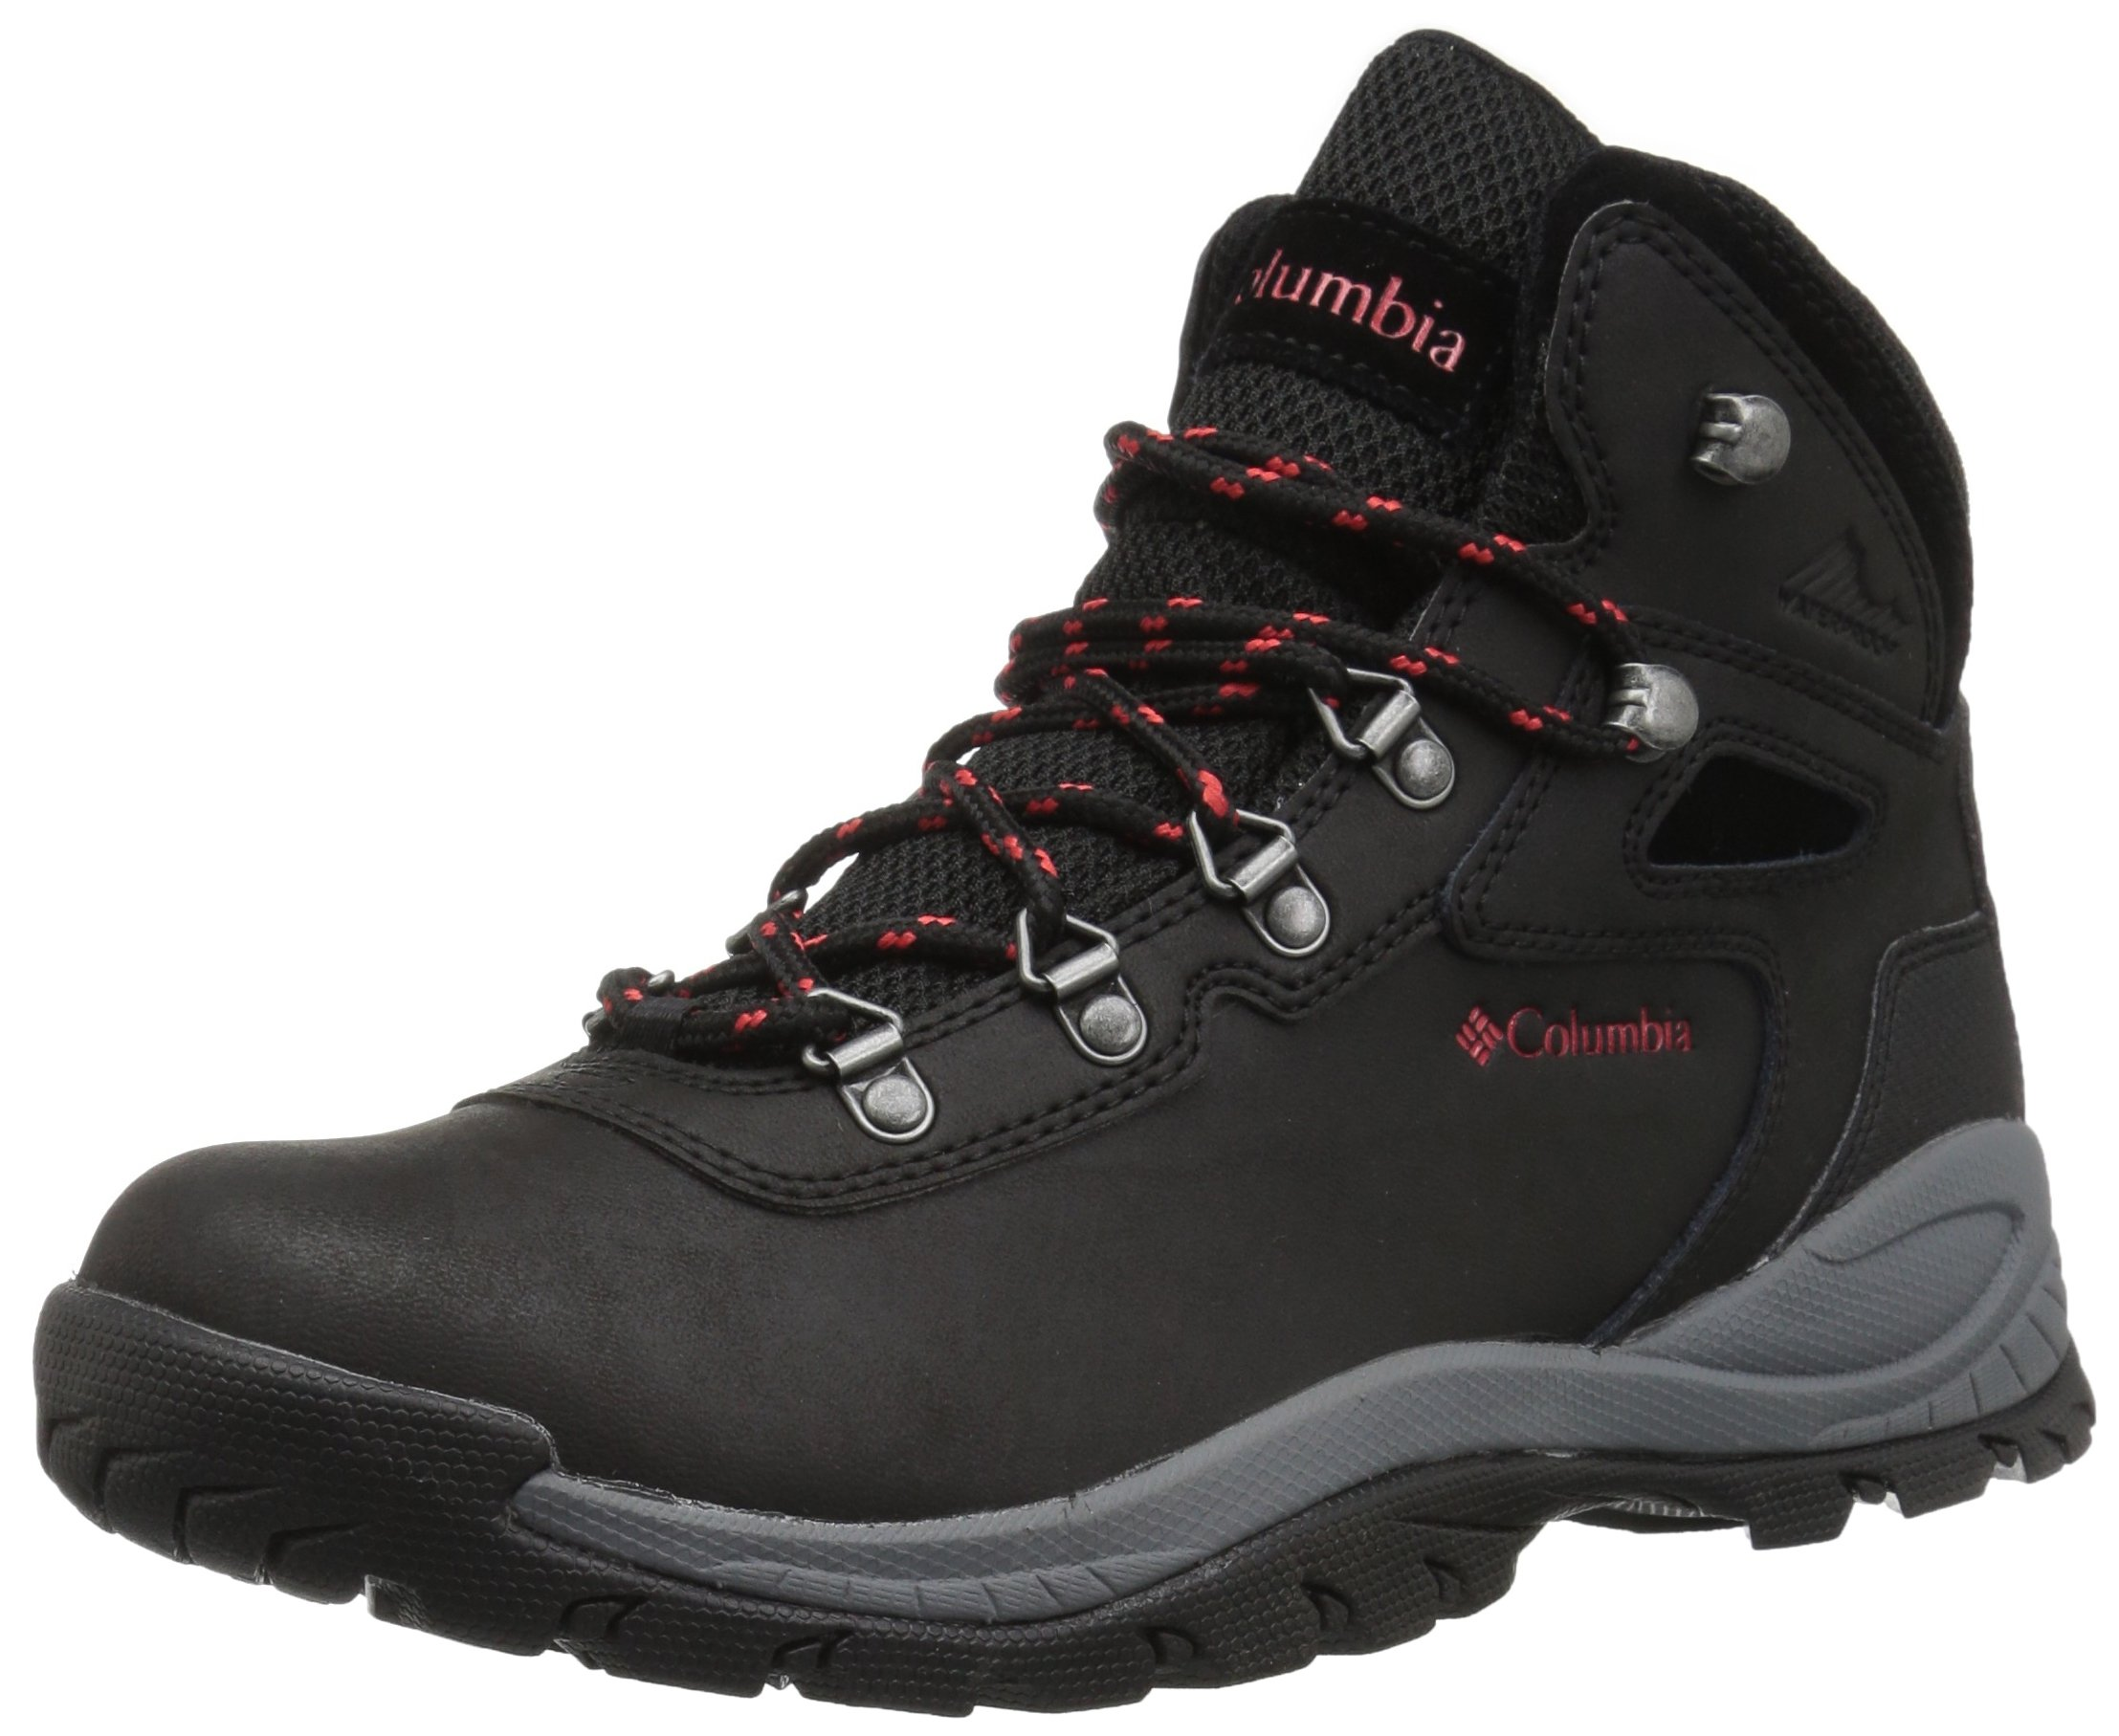 Columbia Women's Newton Ridge Plus Hiking Boot Black/Poppy Red 12 Regular US